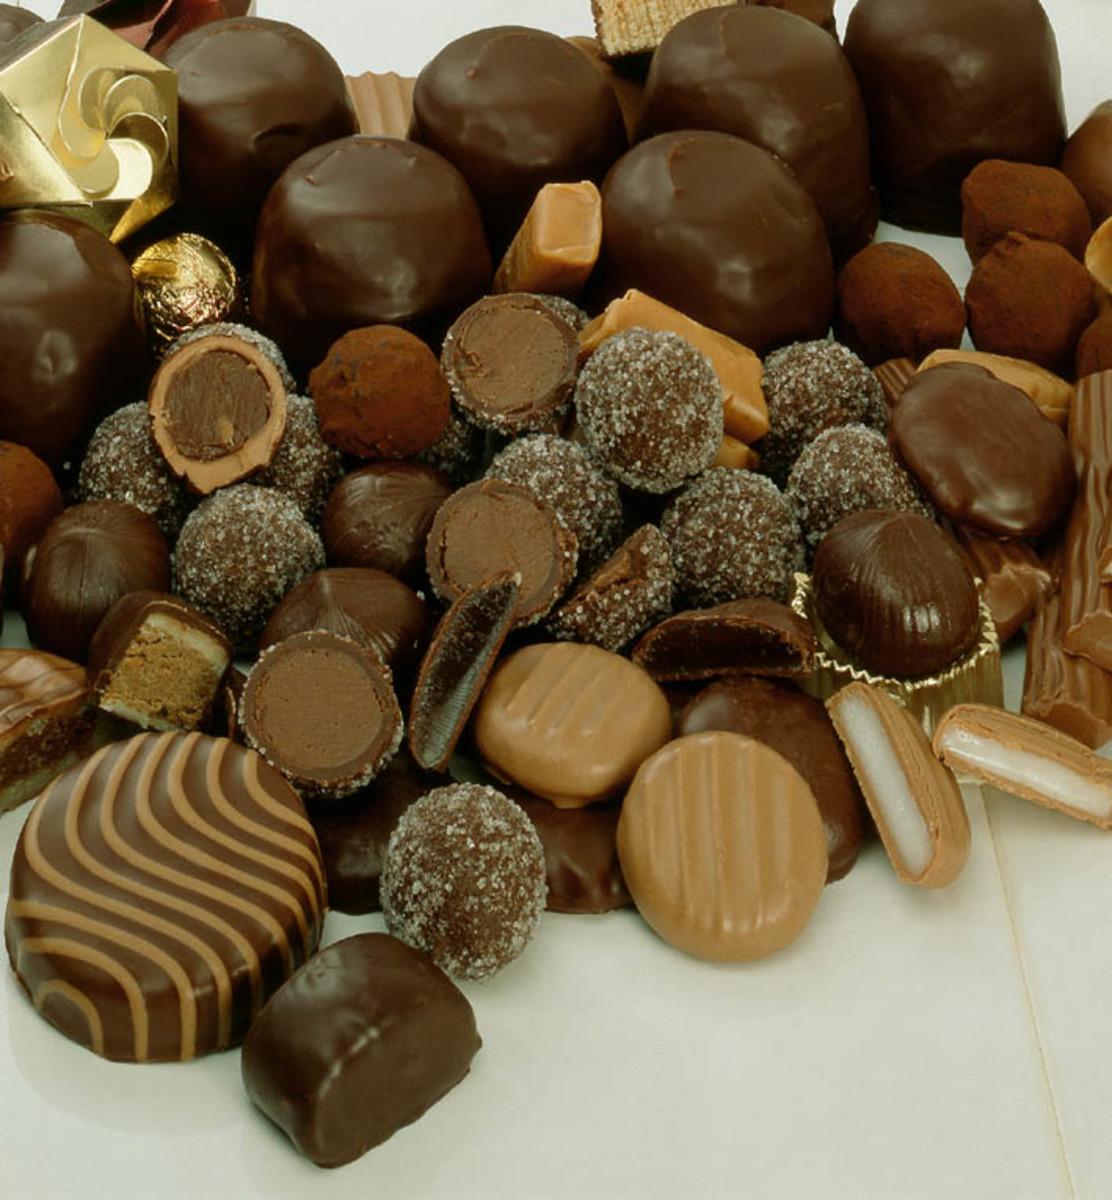 Chocoalates